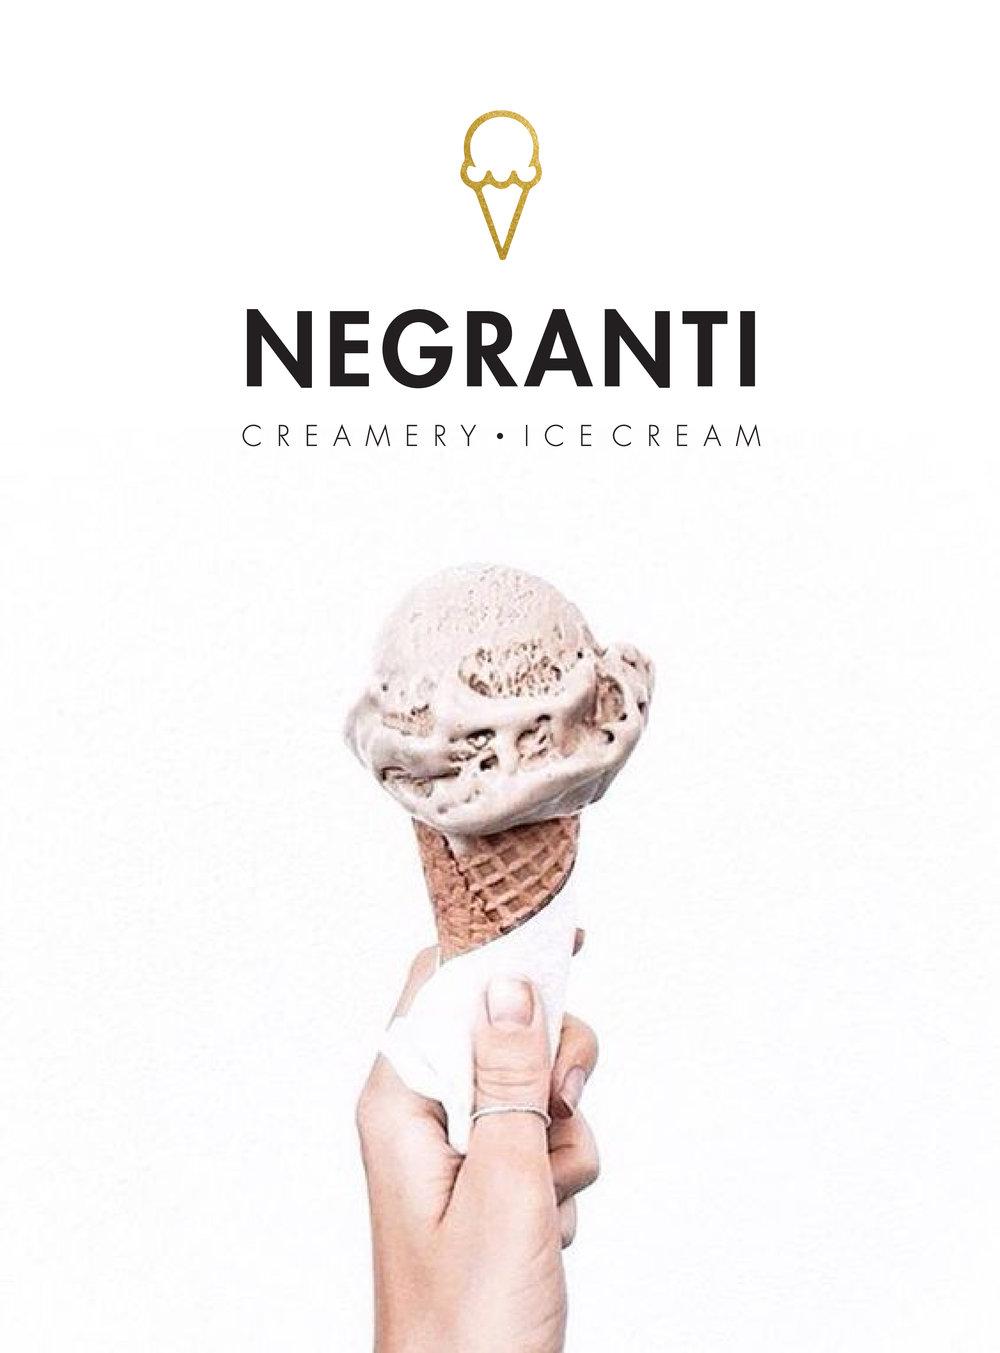 negranti-creamery-logo.jpg